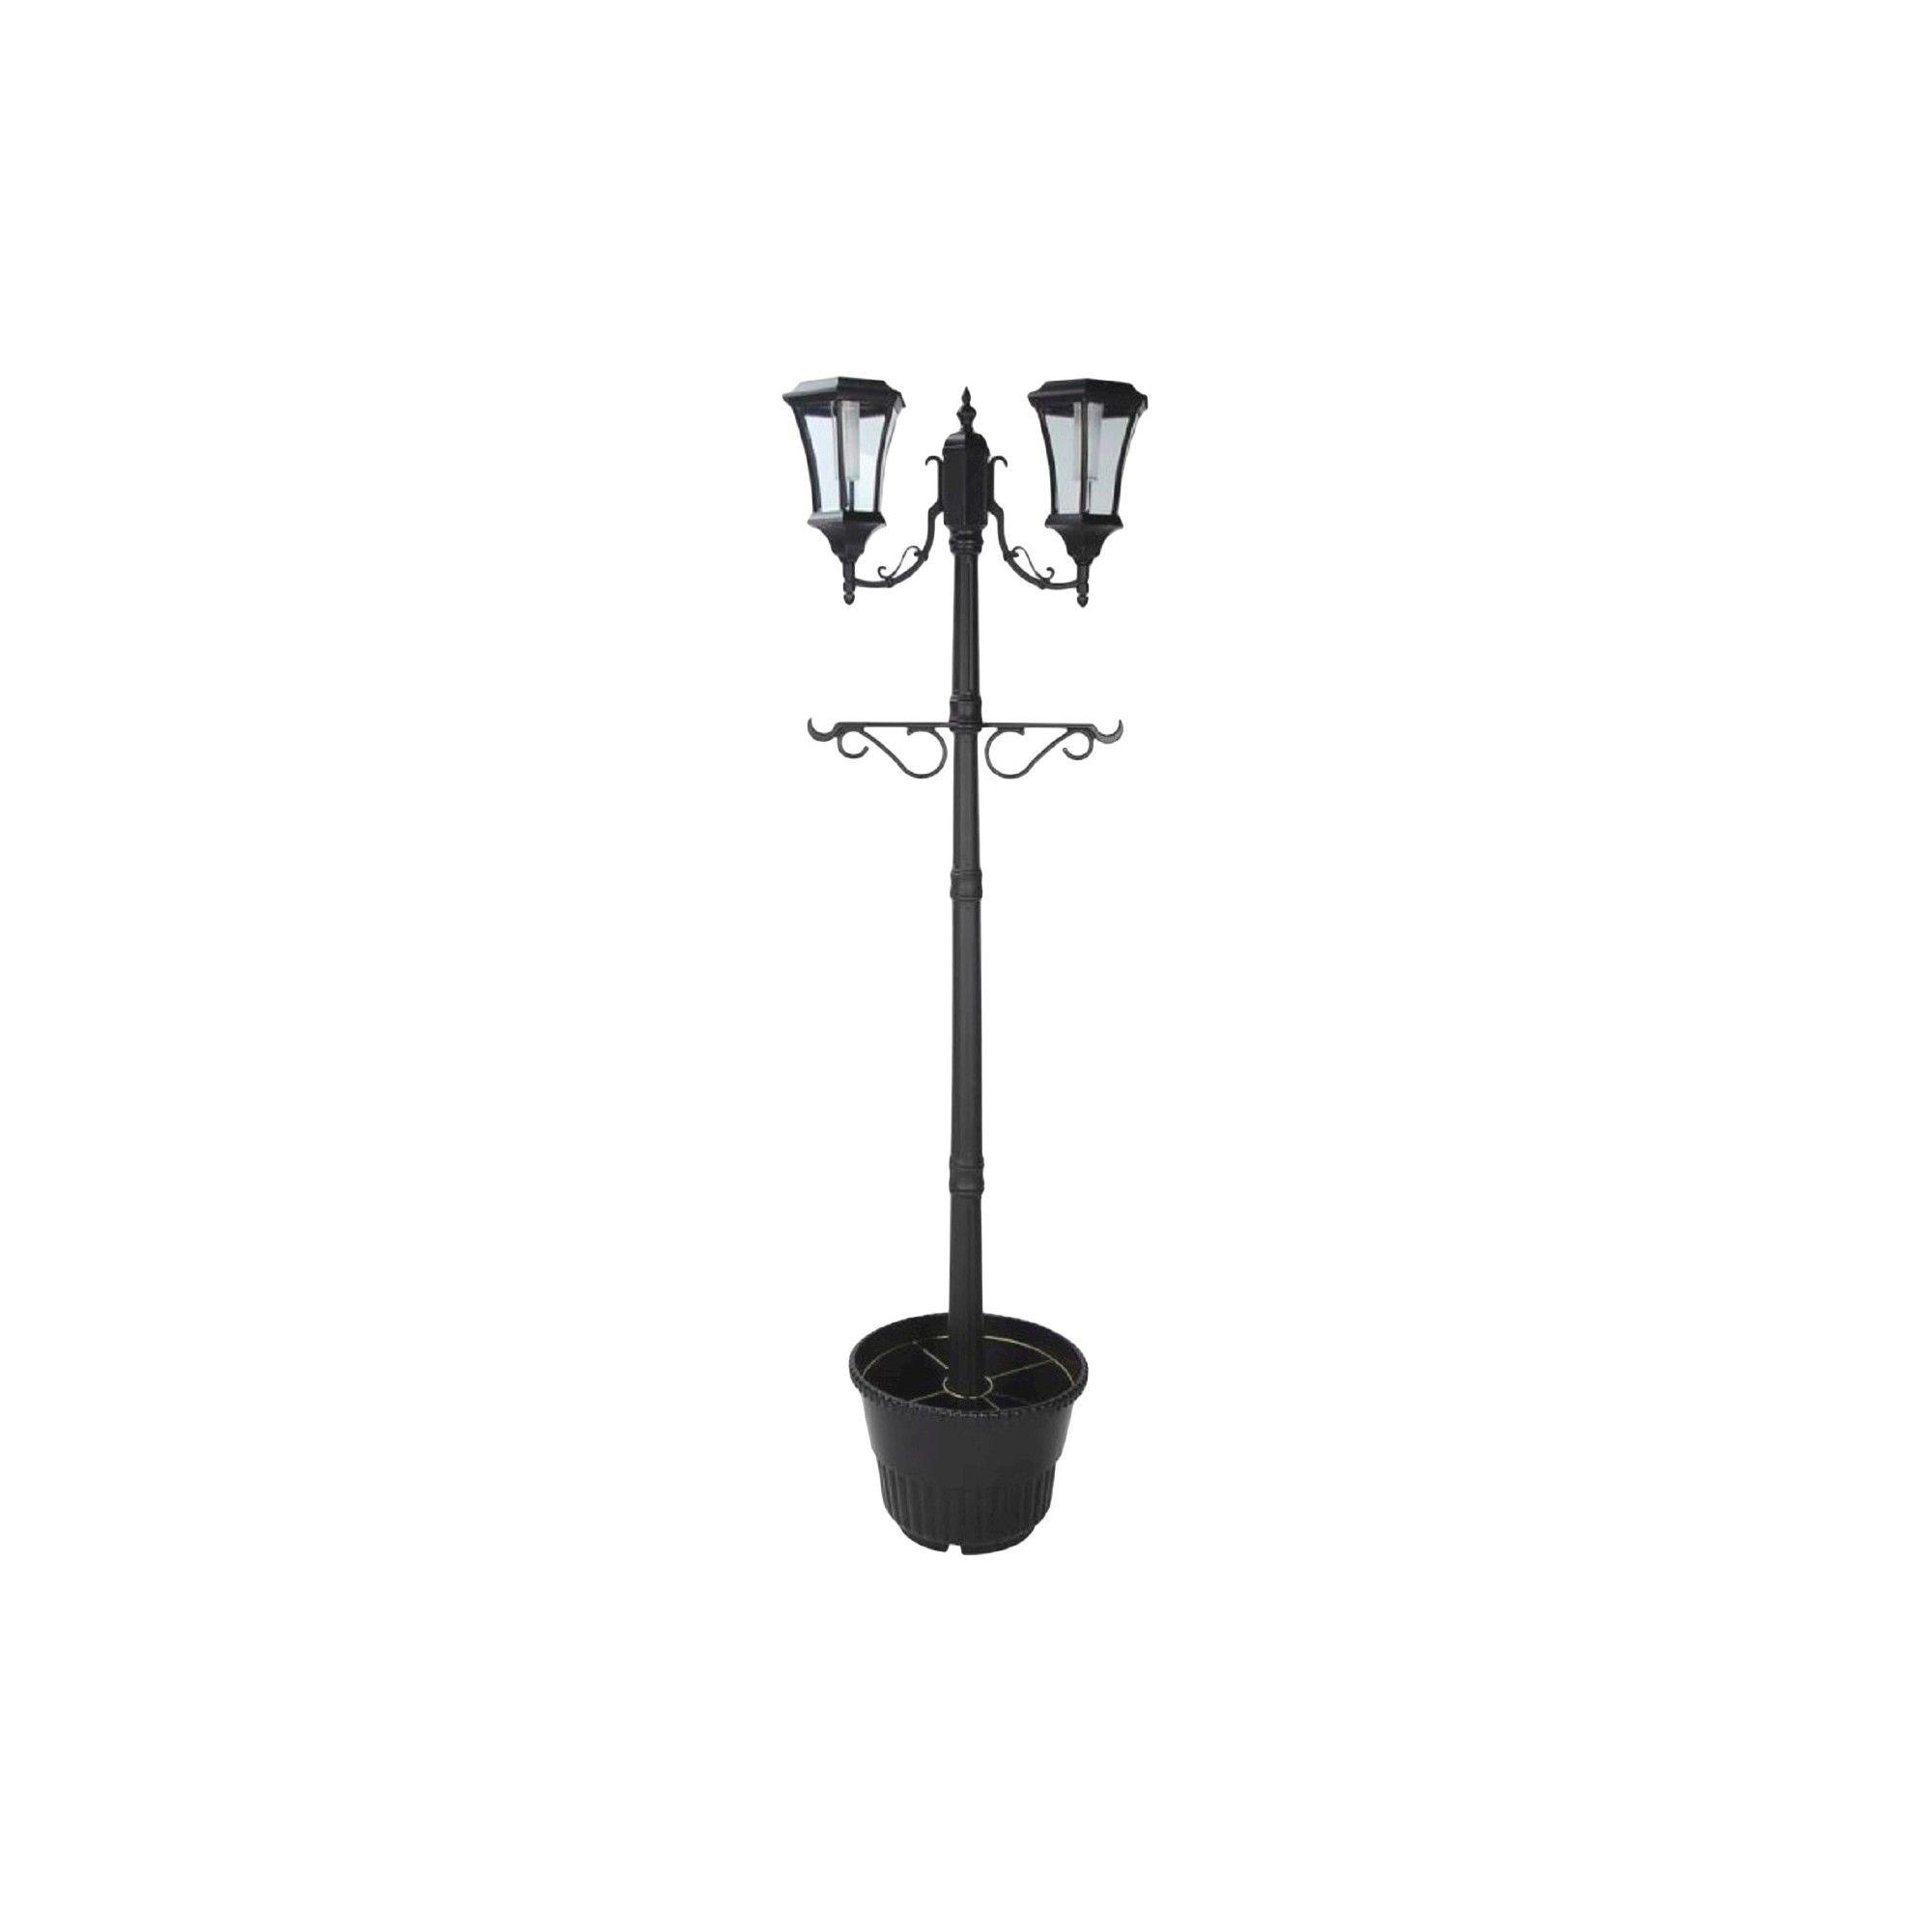 design lights cap with home lamp com uk ebay ost powered depot spotthevuln lam post ideas fence solar planter